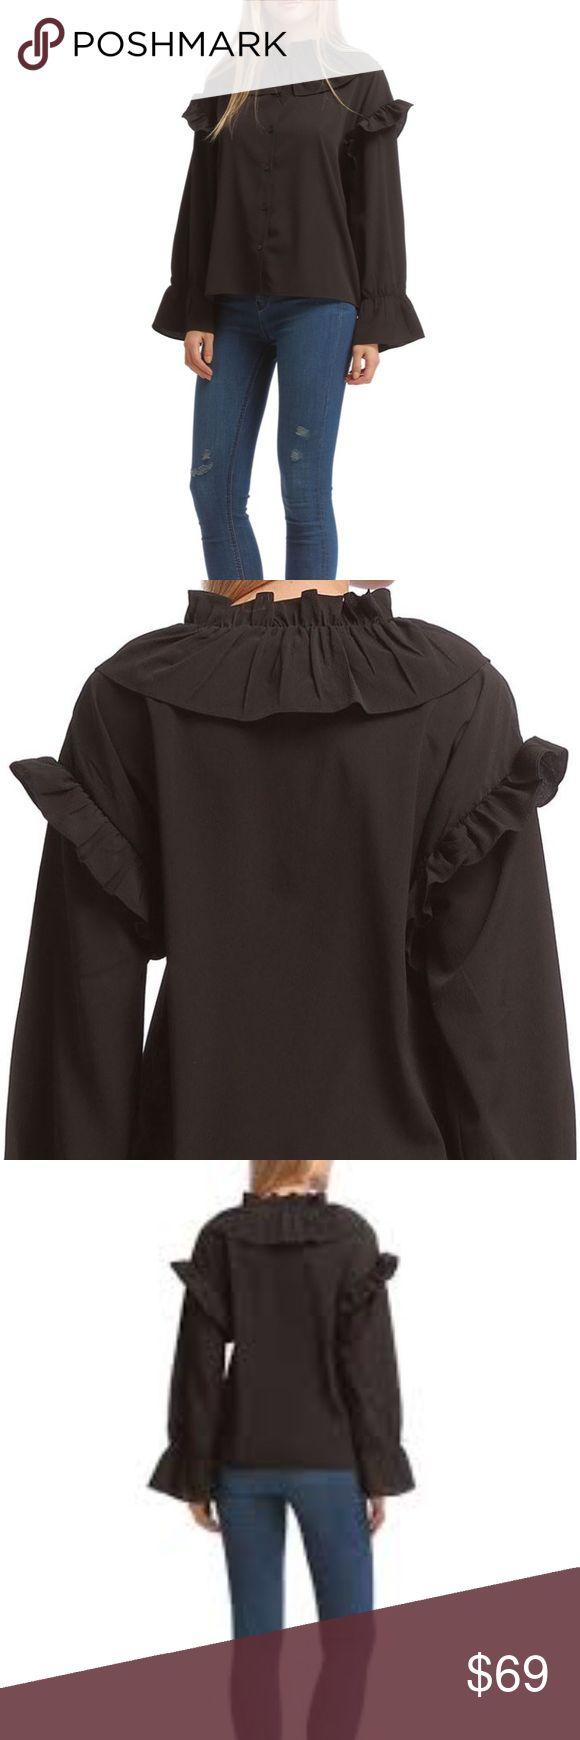 I just added this listing on Poshmark: Walter Baker Mistie Top. #shopmycloset #poshmark #fashion #shopping #style #forsale #Walter Baker #Tops